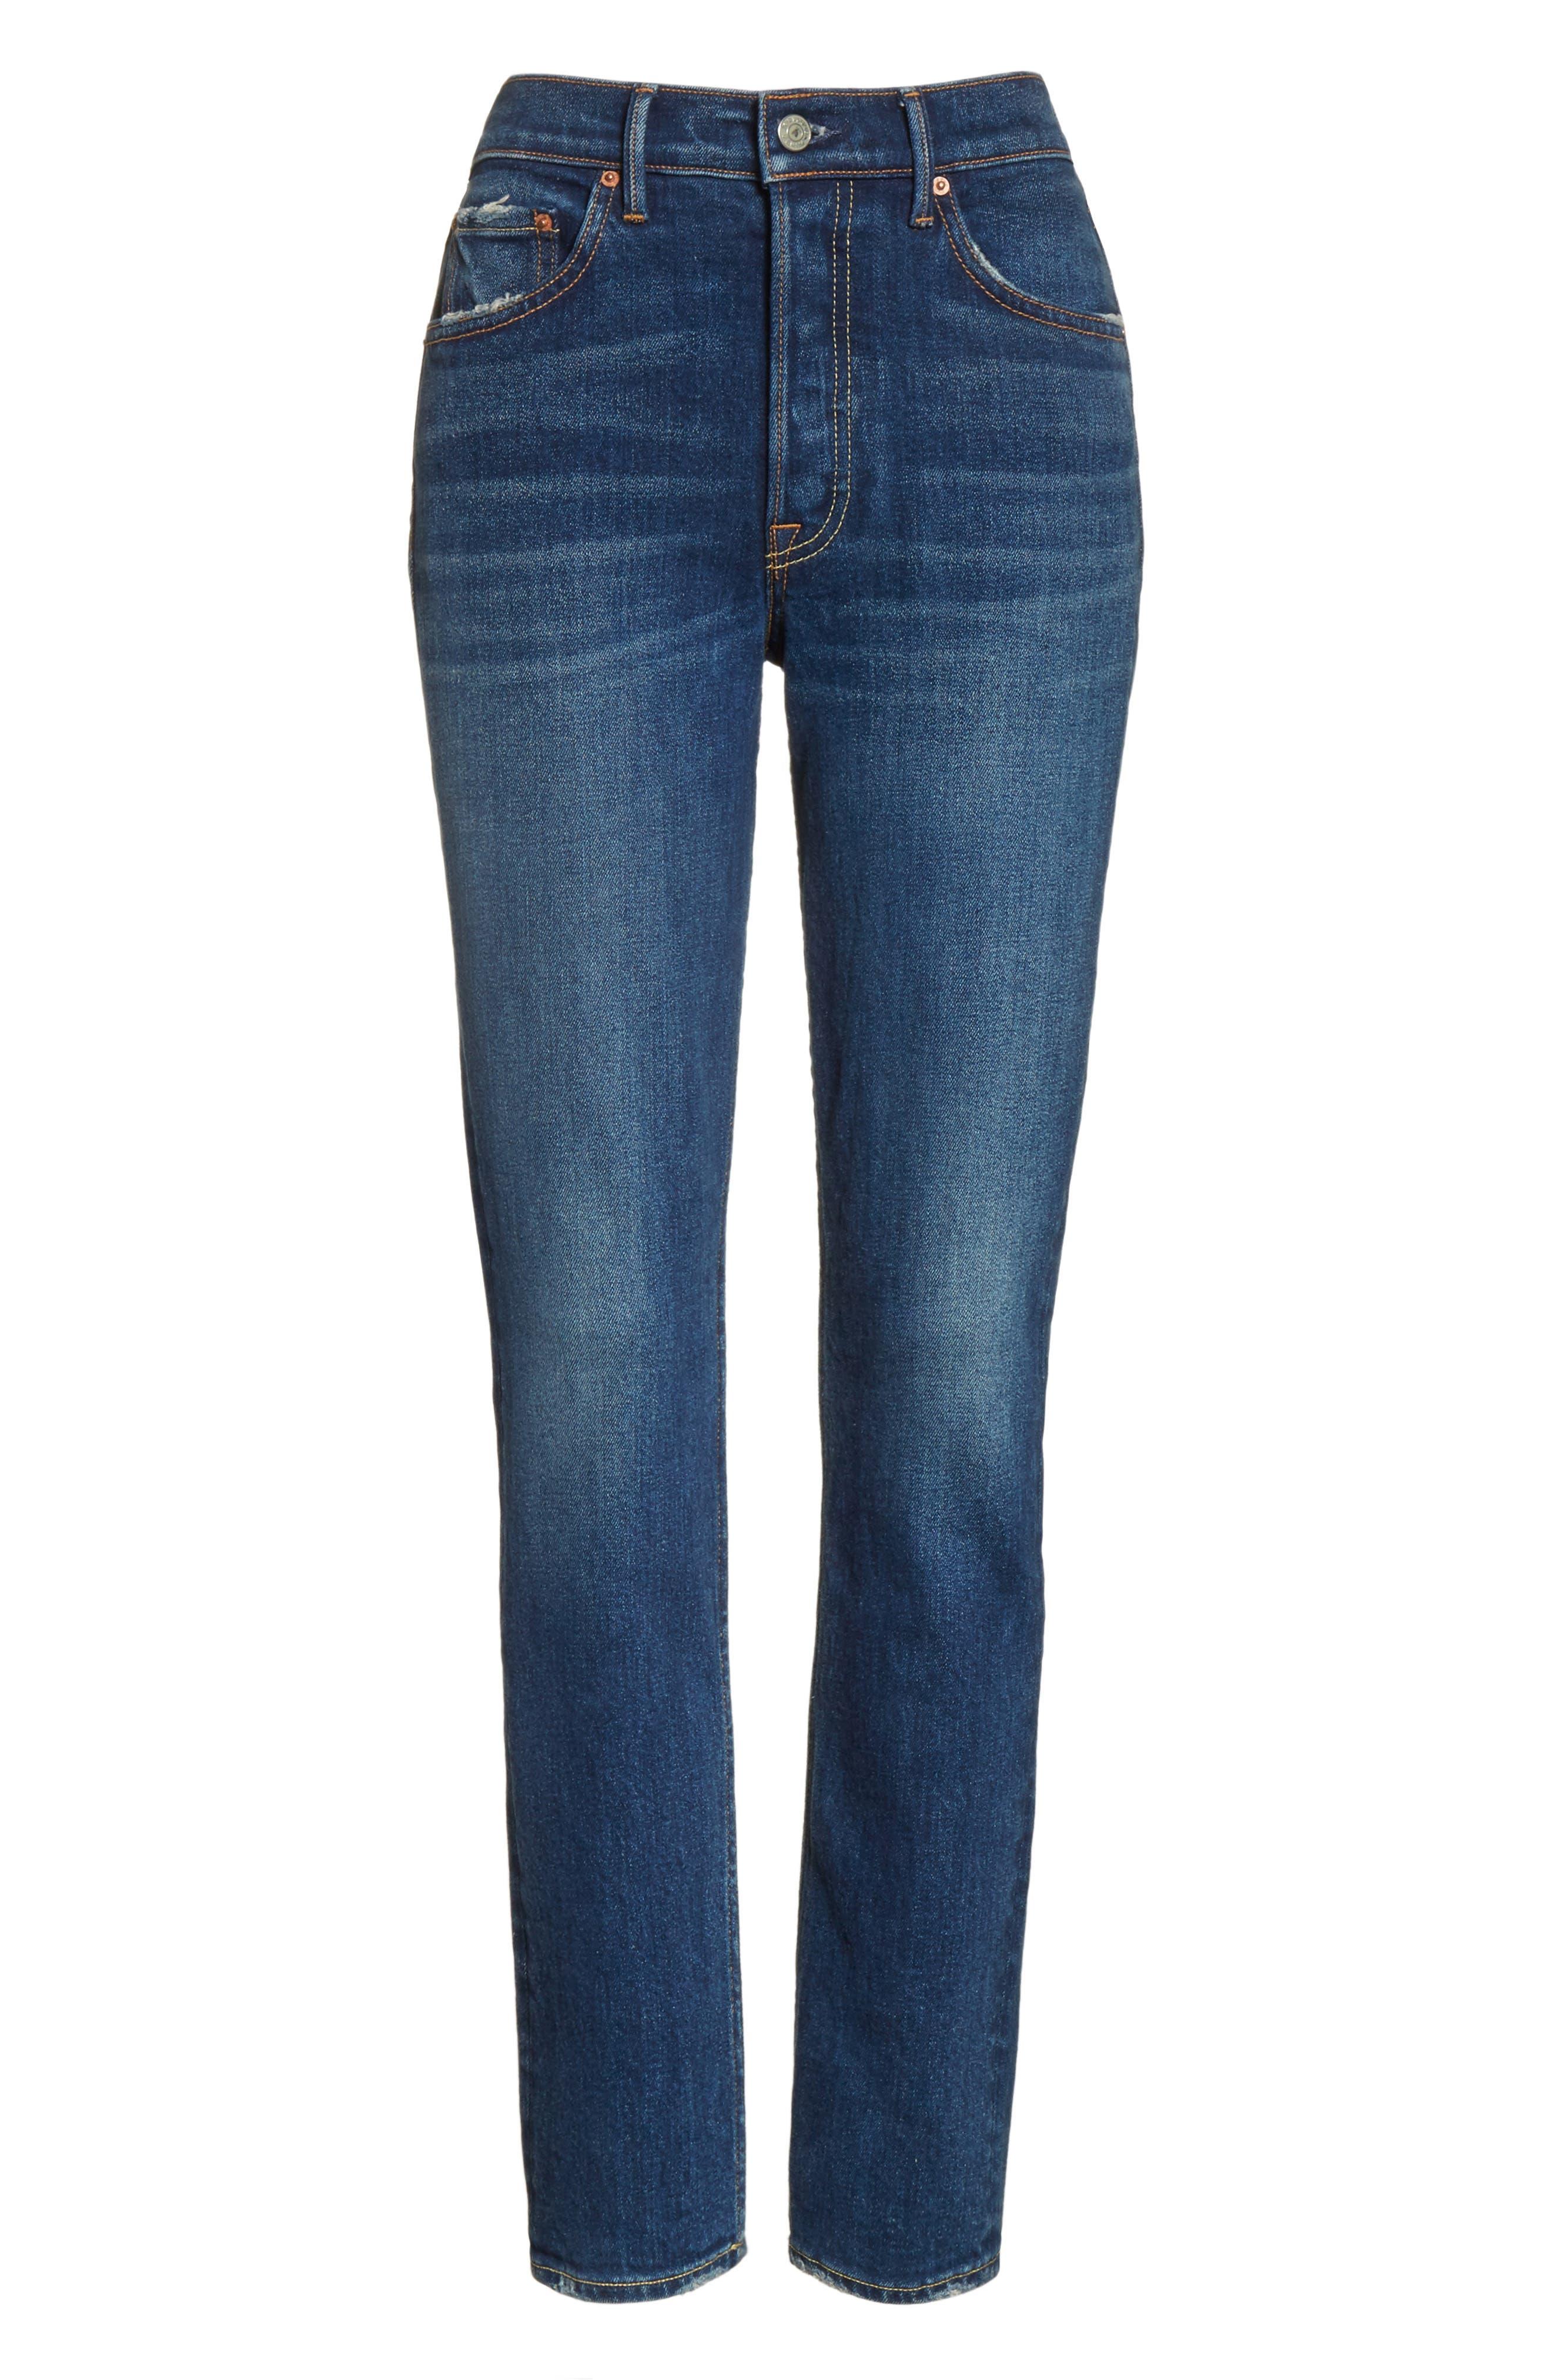 Karolina High Waist Skinny Jeans,                             Alternate thumbnail 6, color,                             JOAN JETT